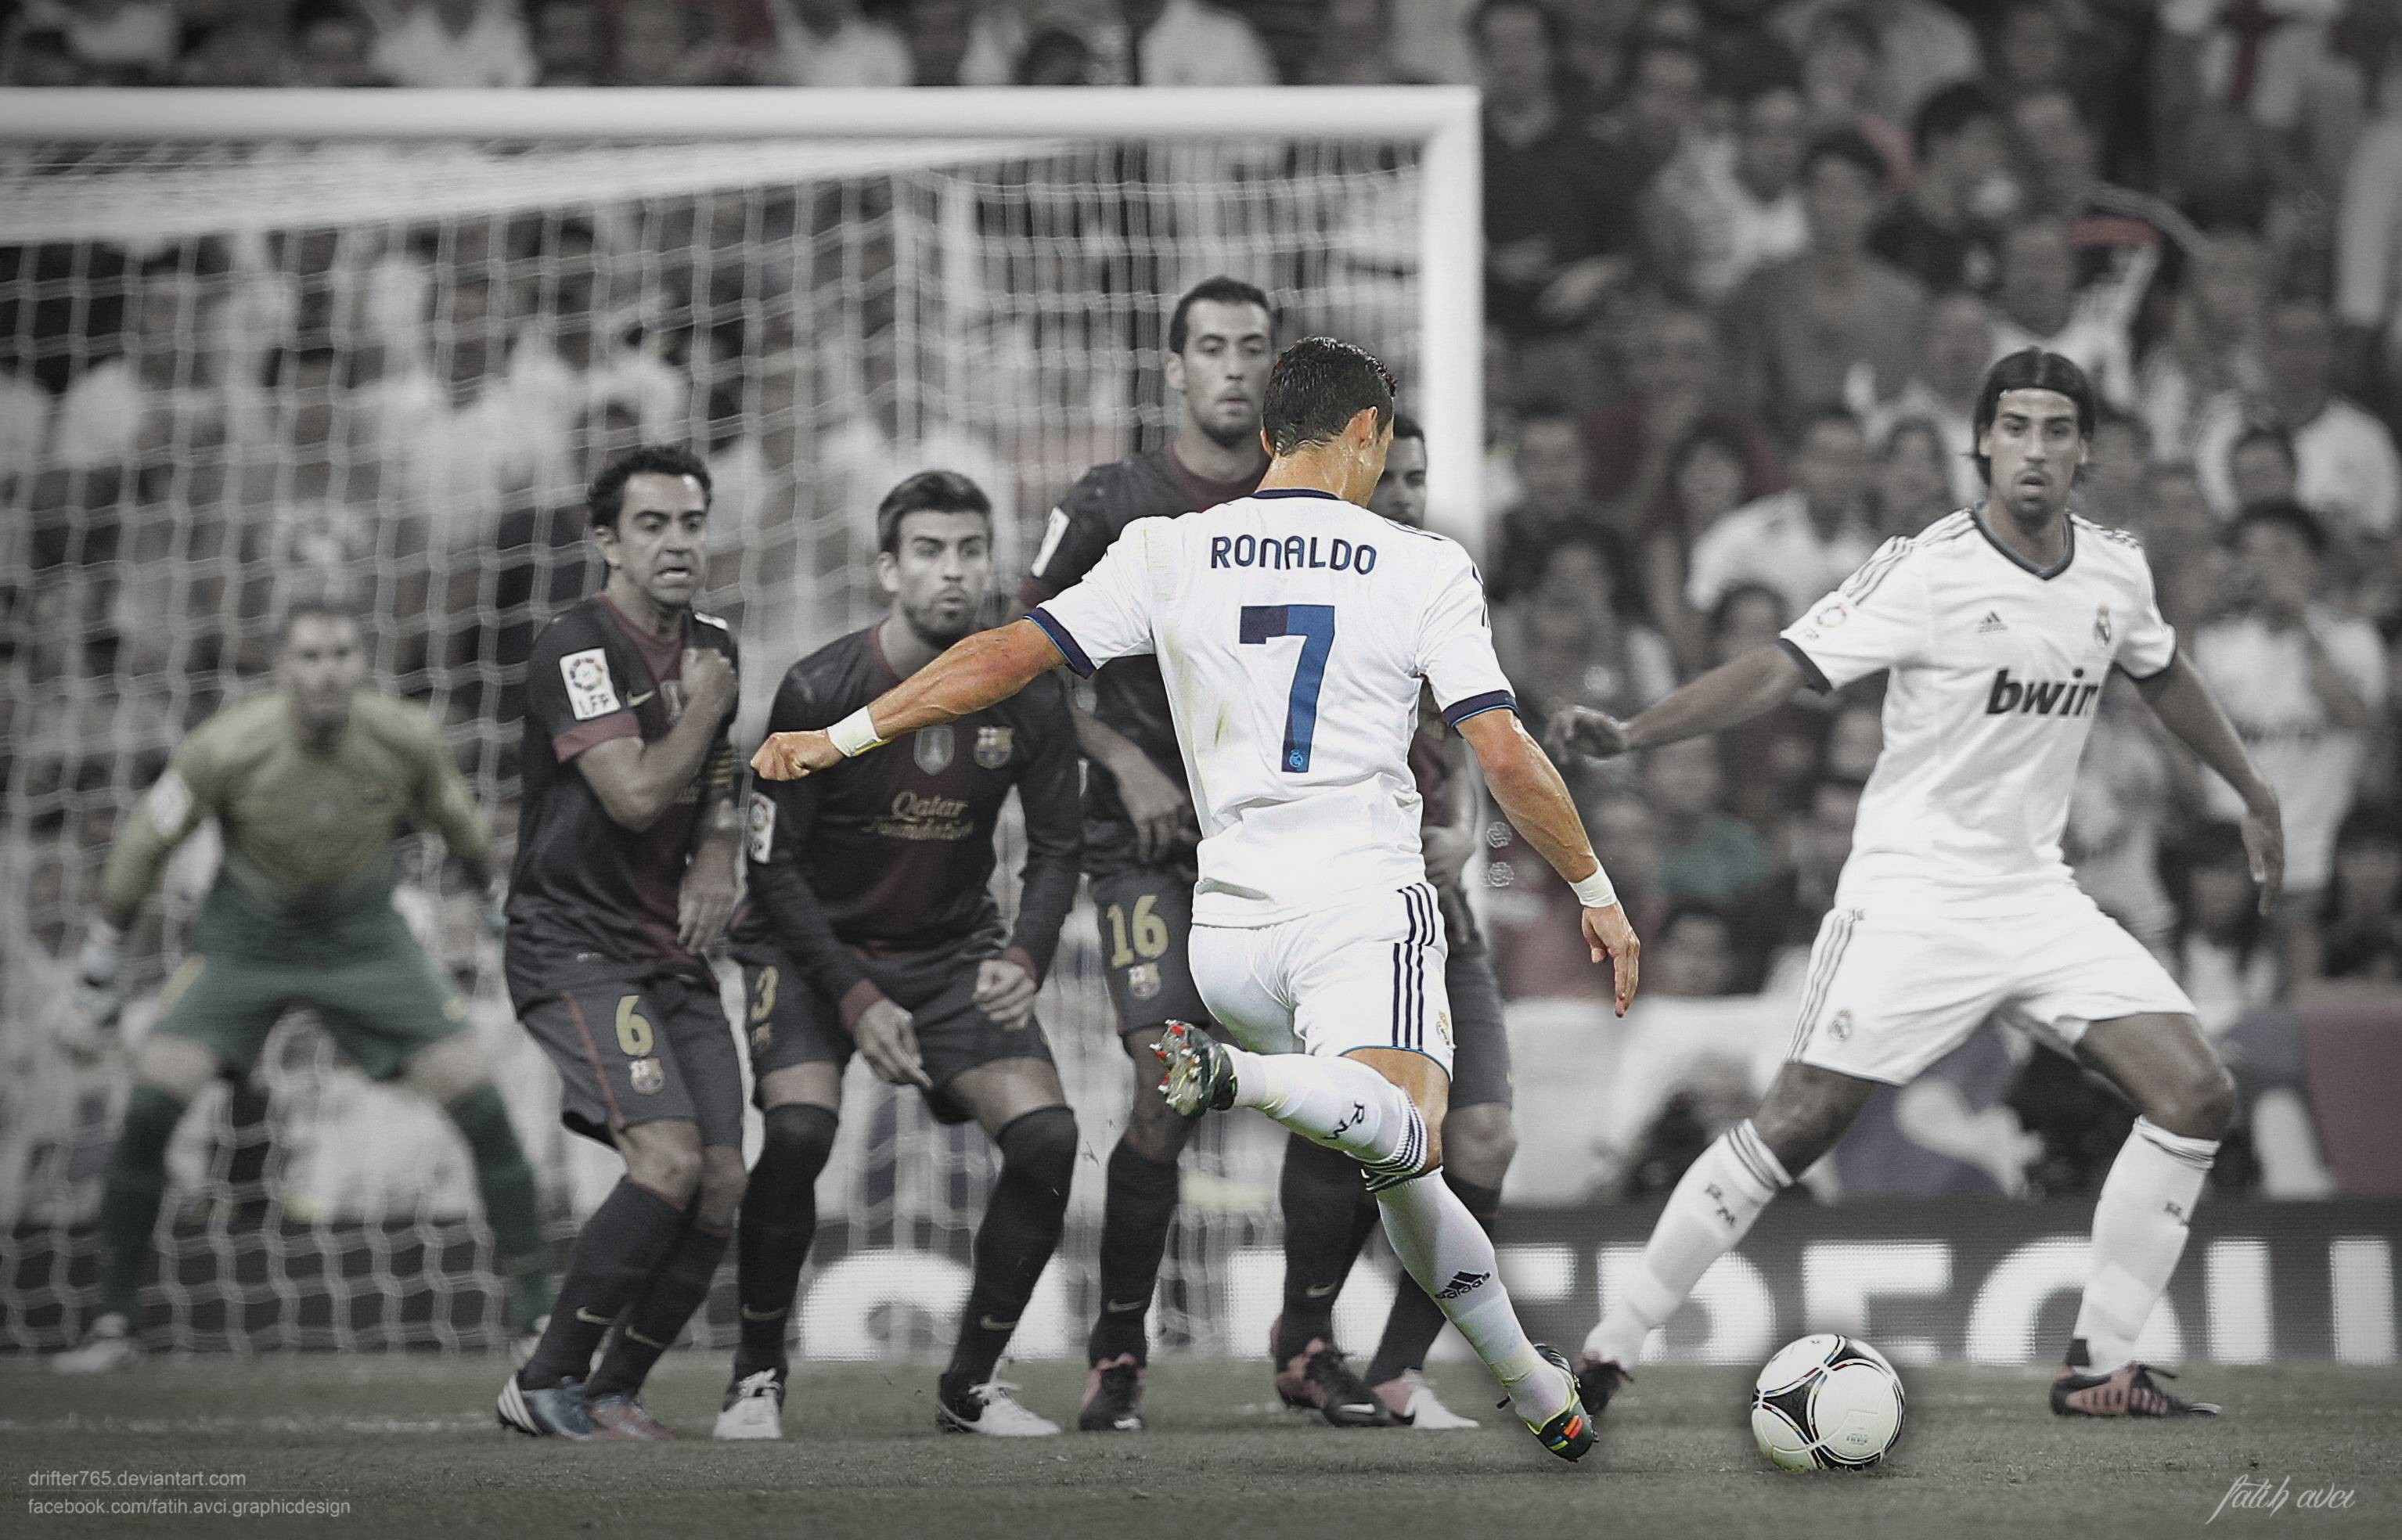 Cristiano Ronaldo Free Kick Wallpaper   HD Wallpapers